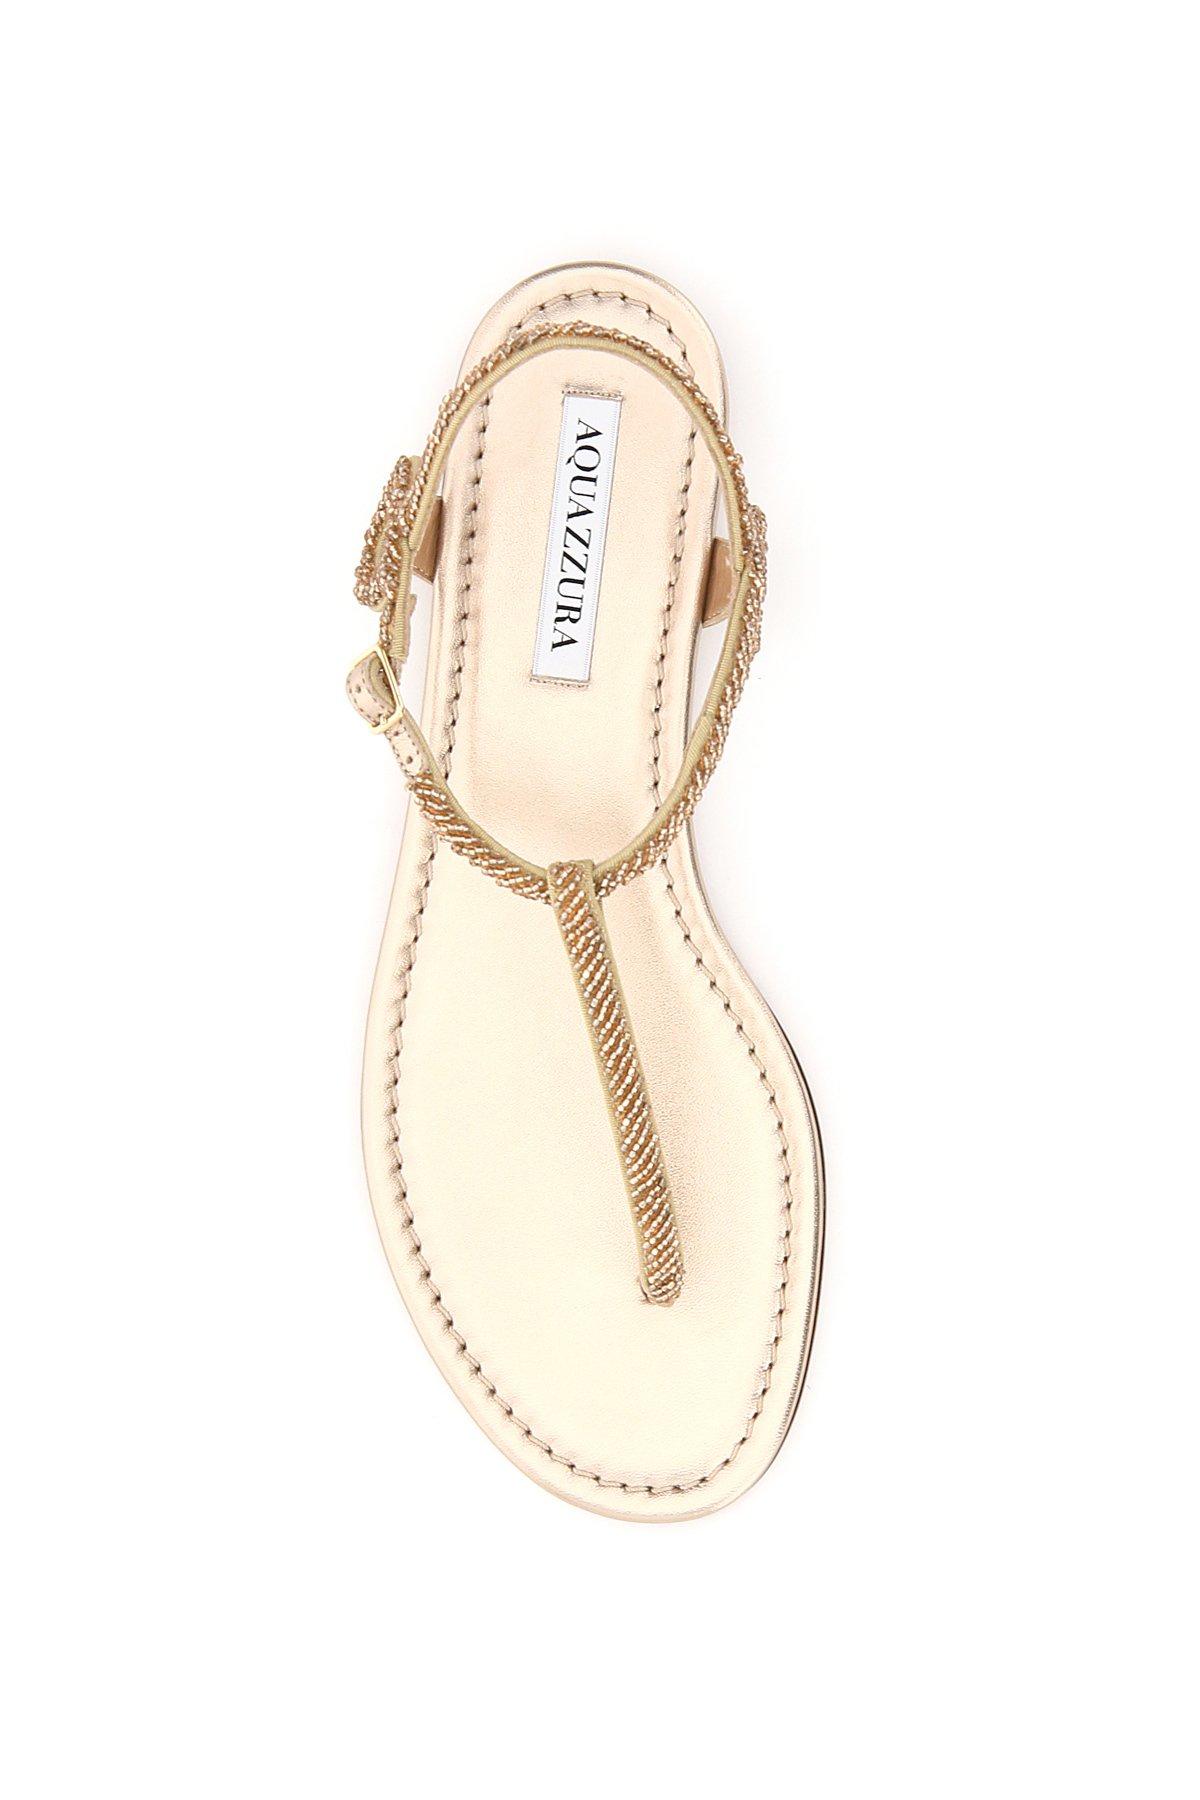 Aquazzura sandali flat almost bare beads